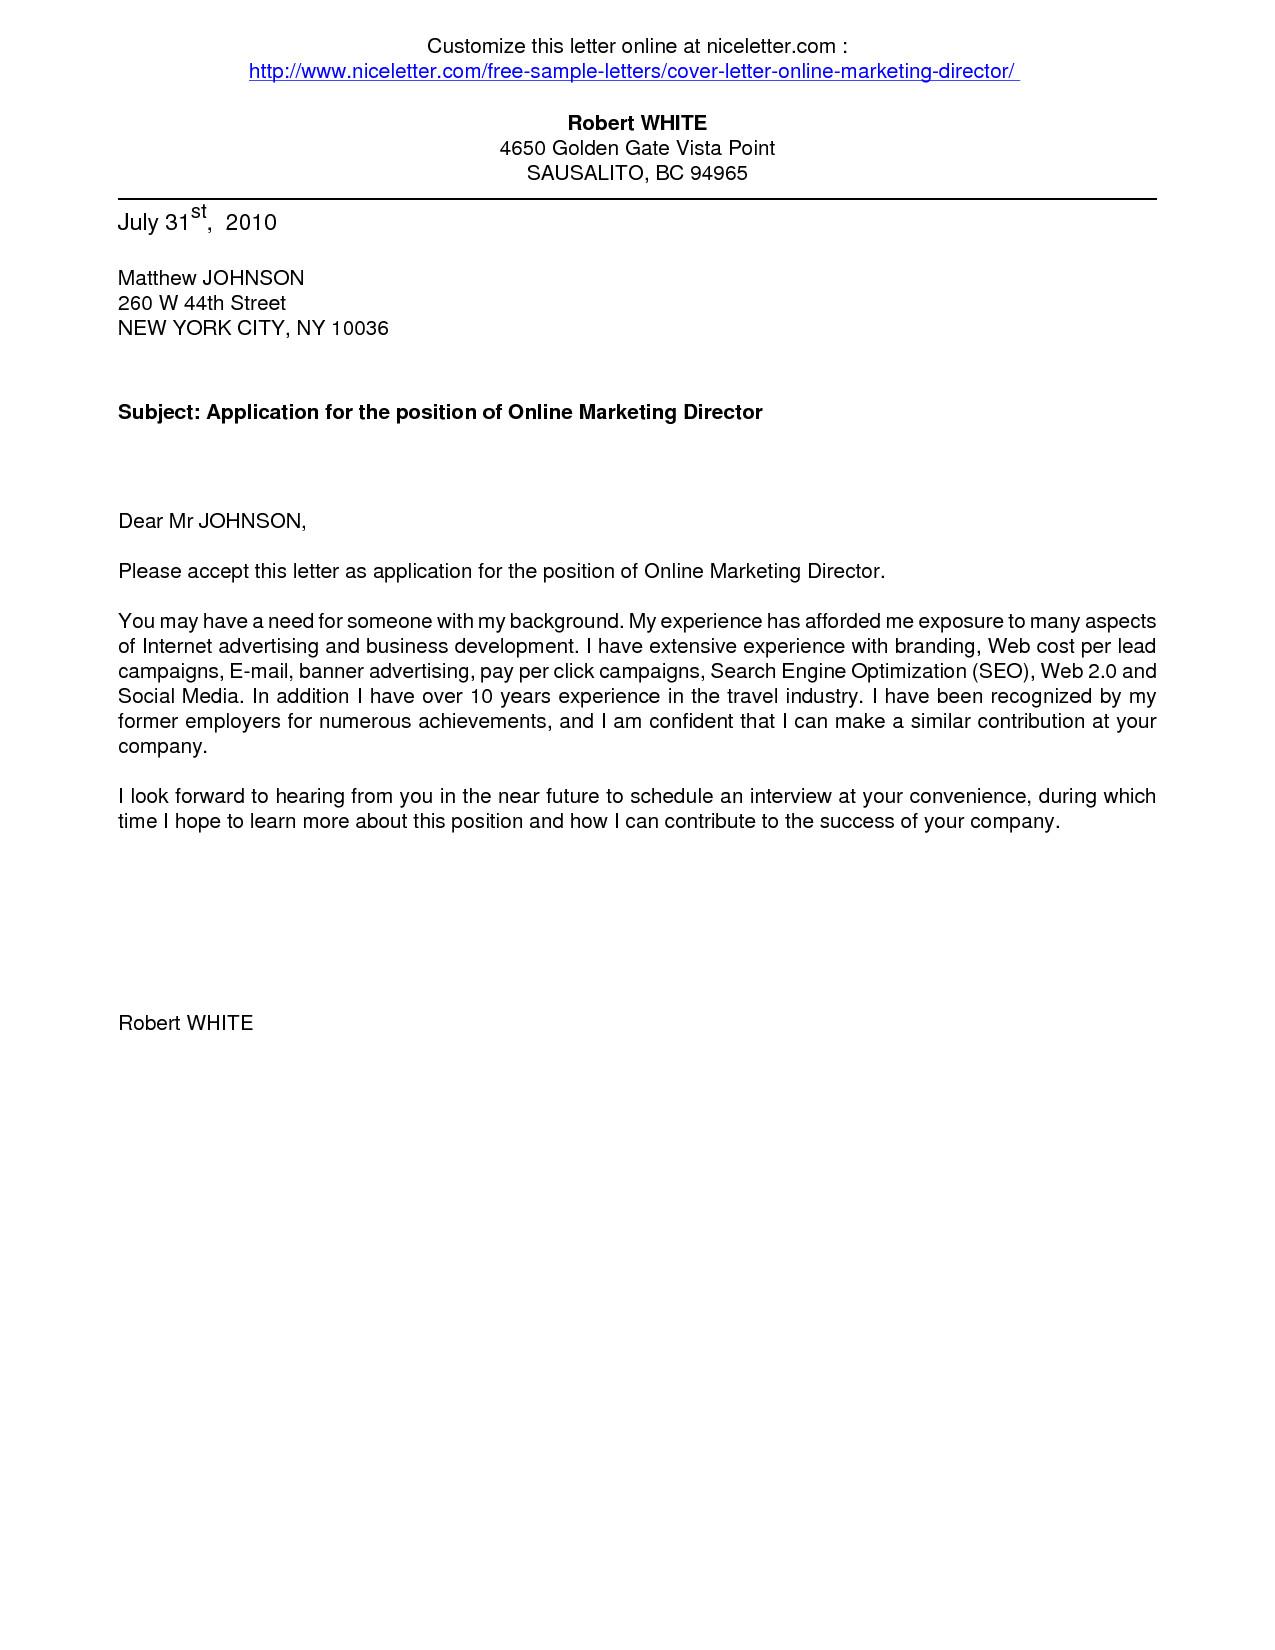 download cover letter format